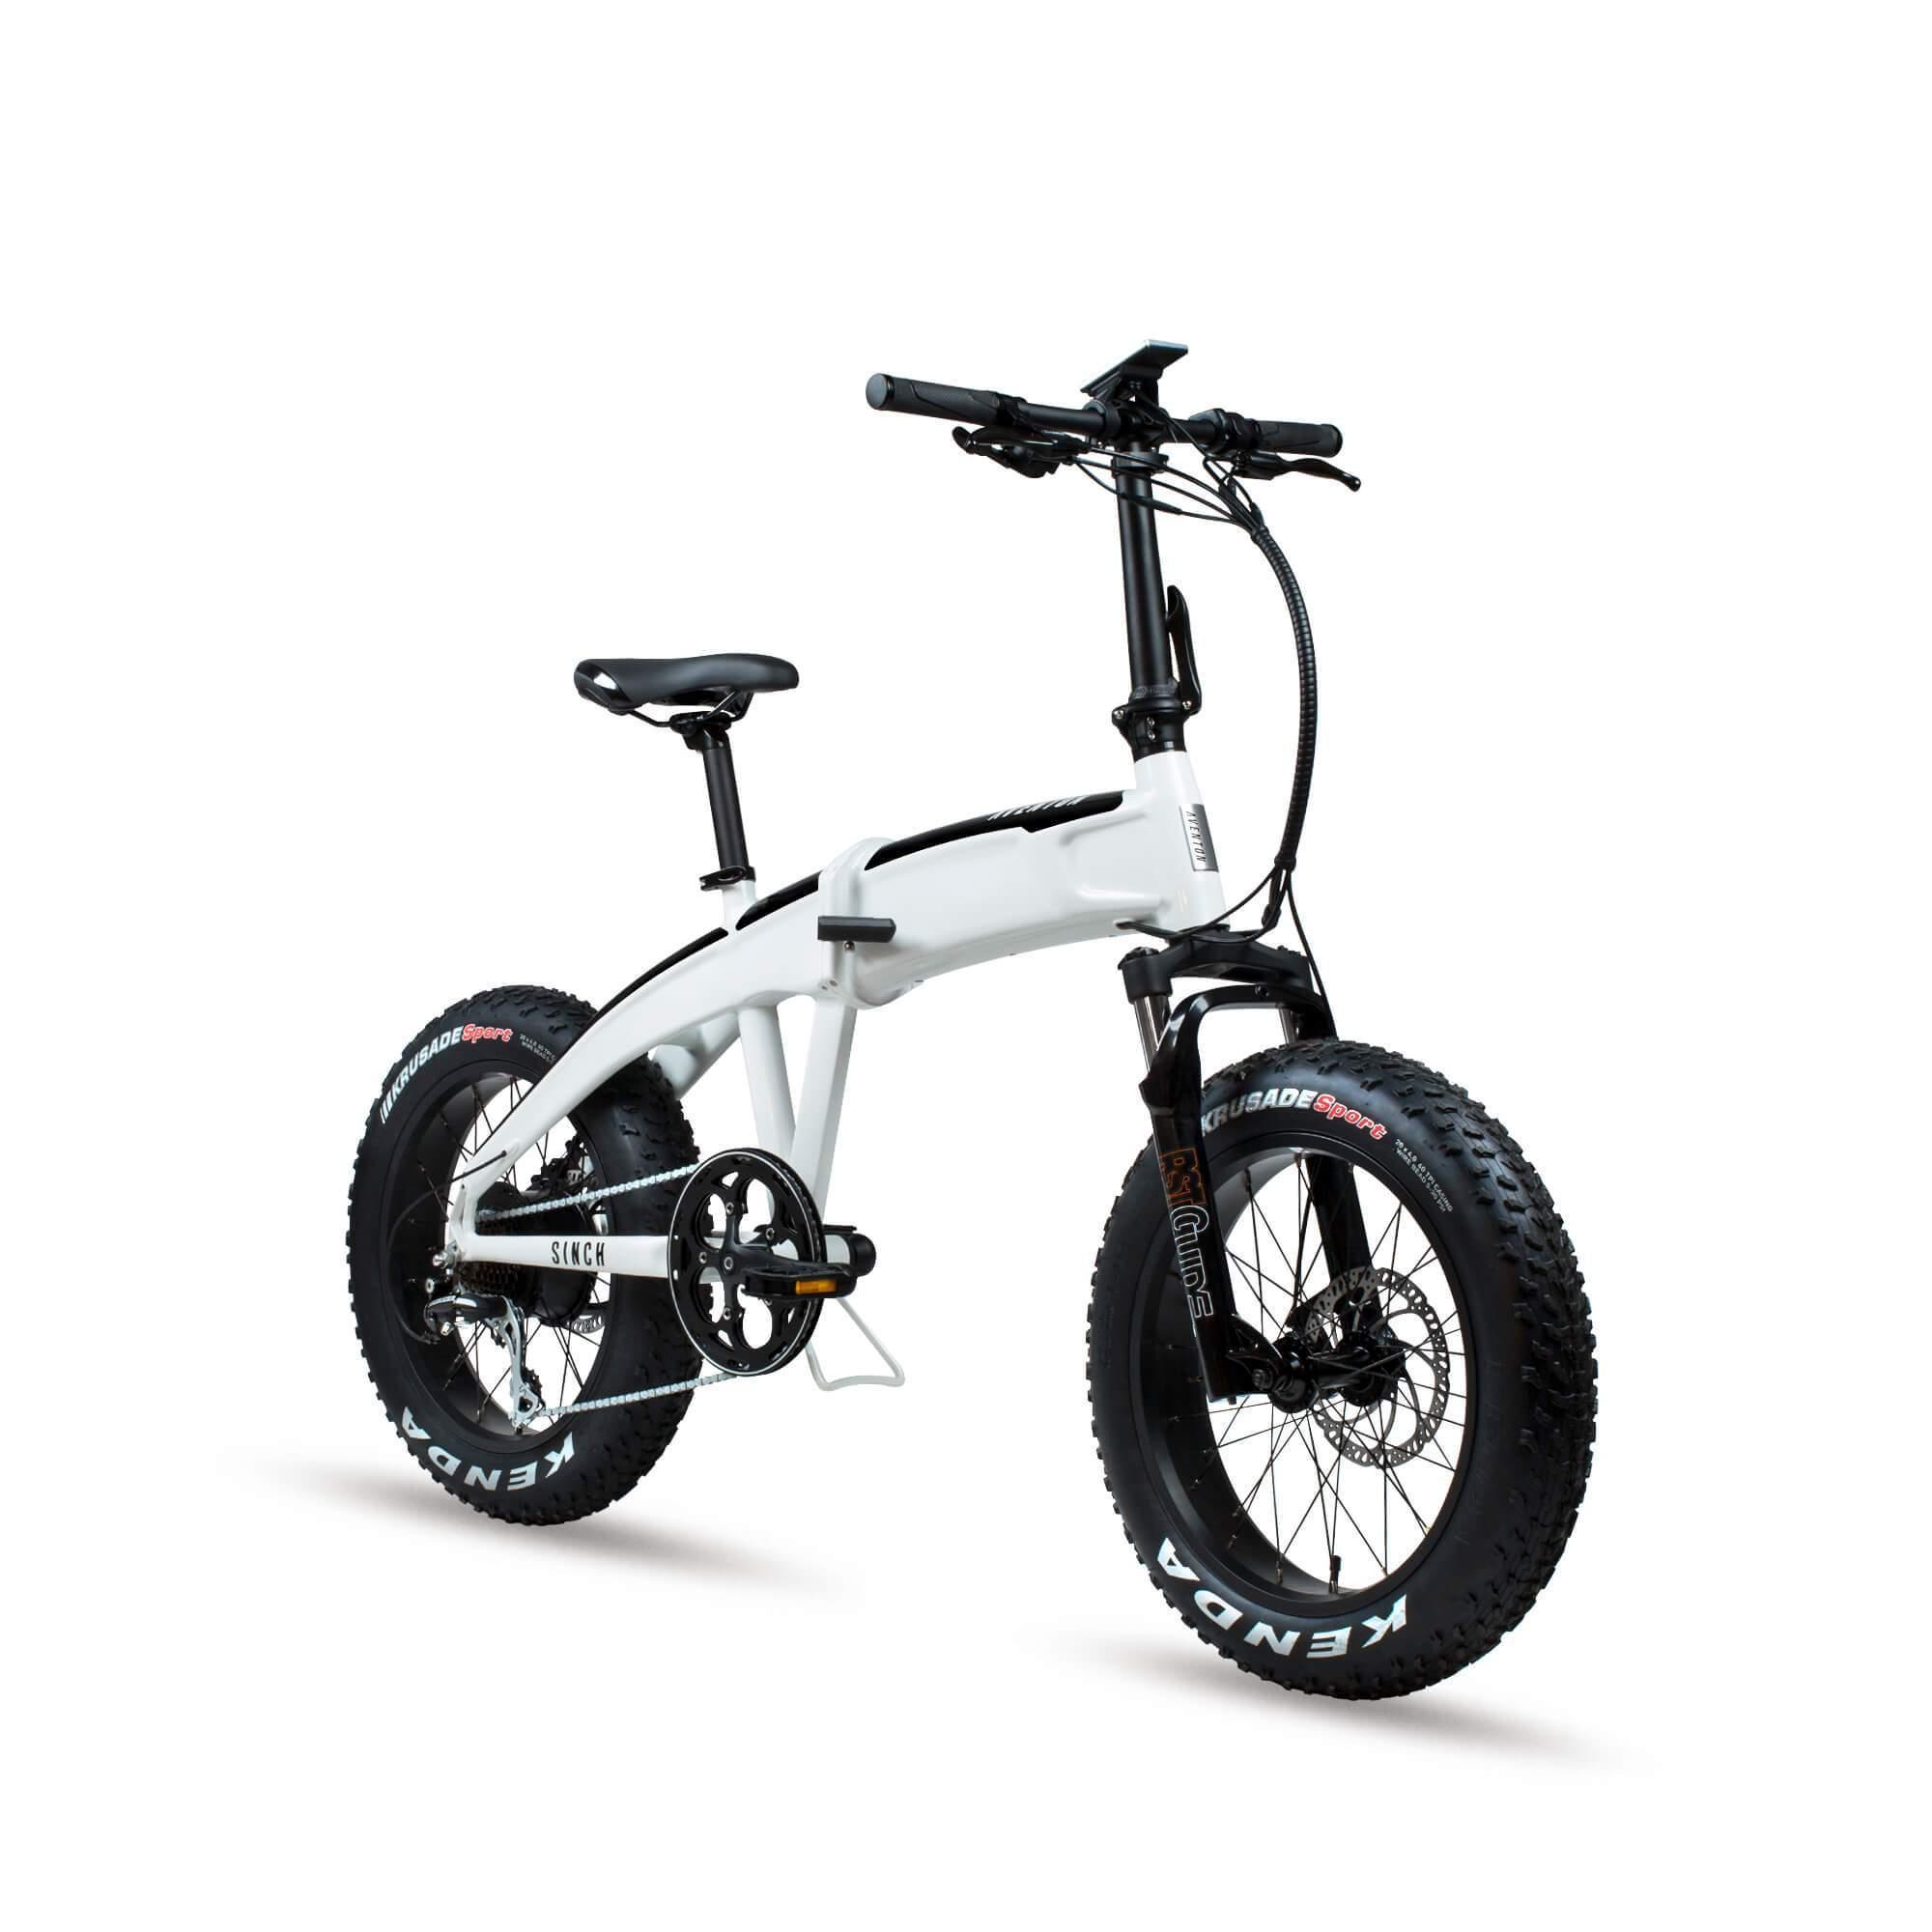 Sinch Foldable E-Bike